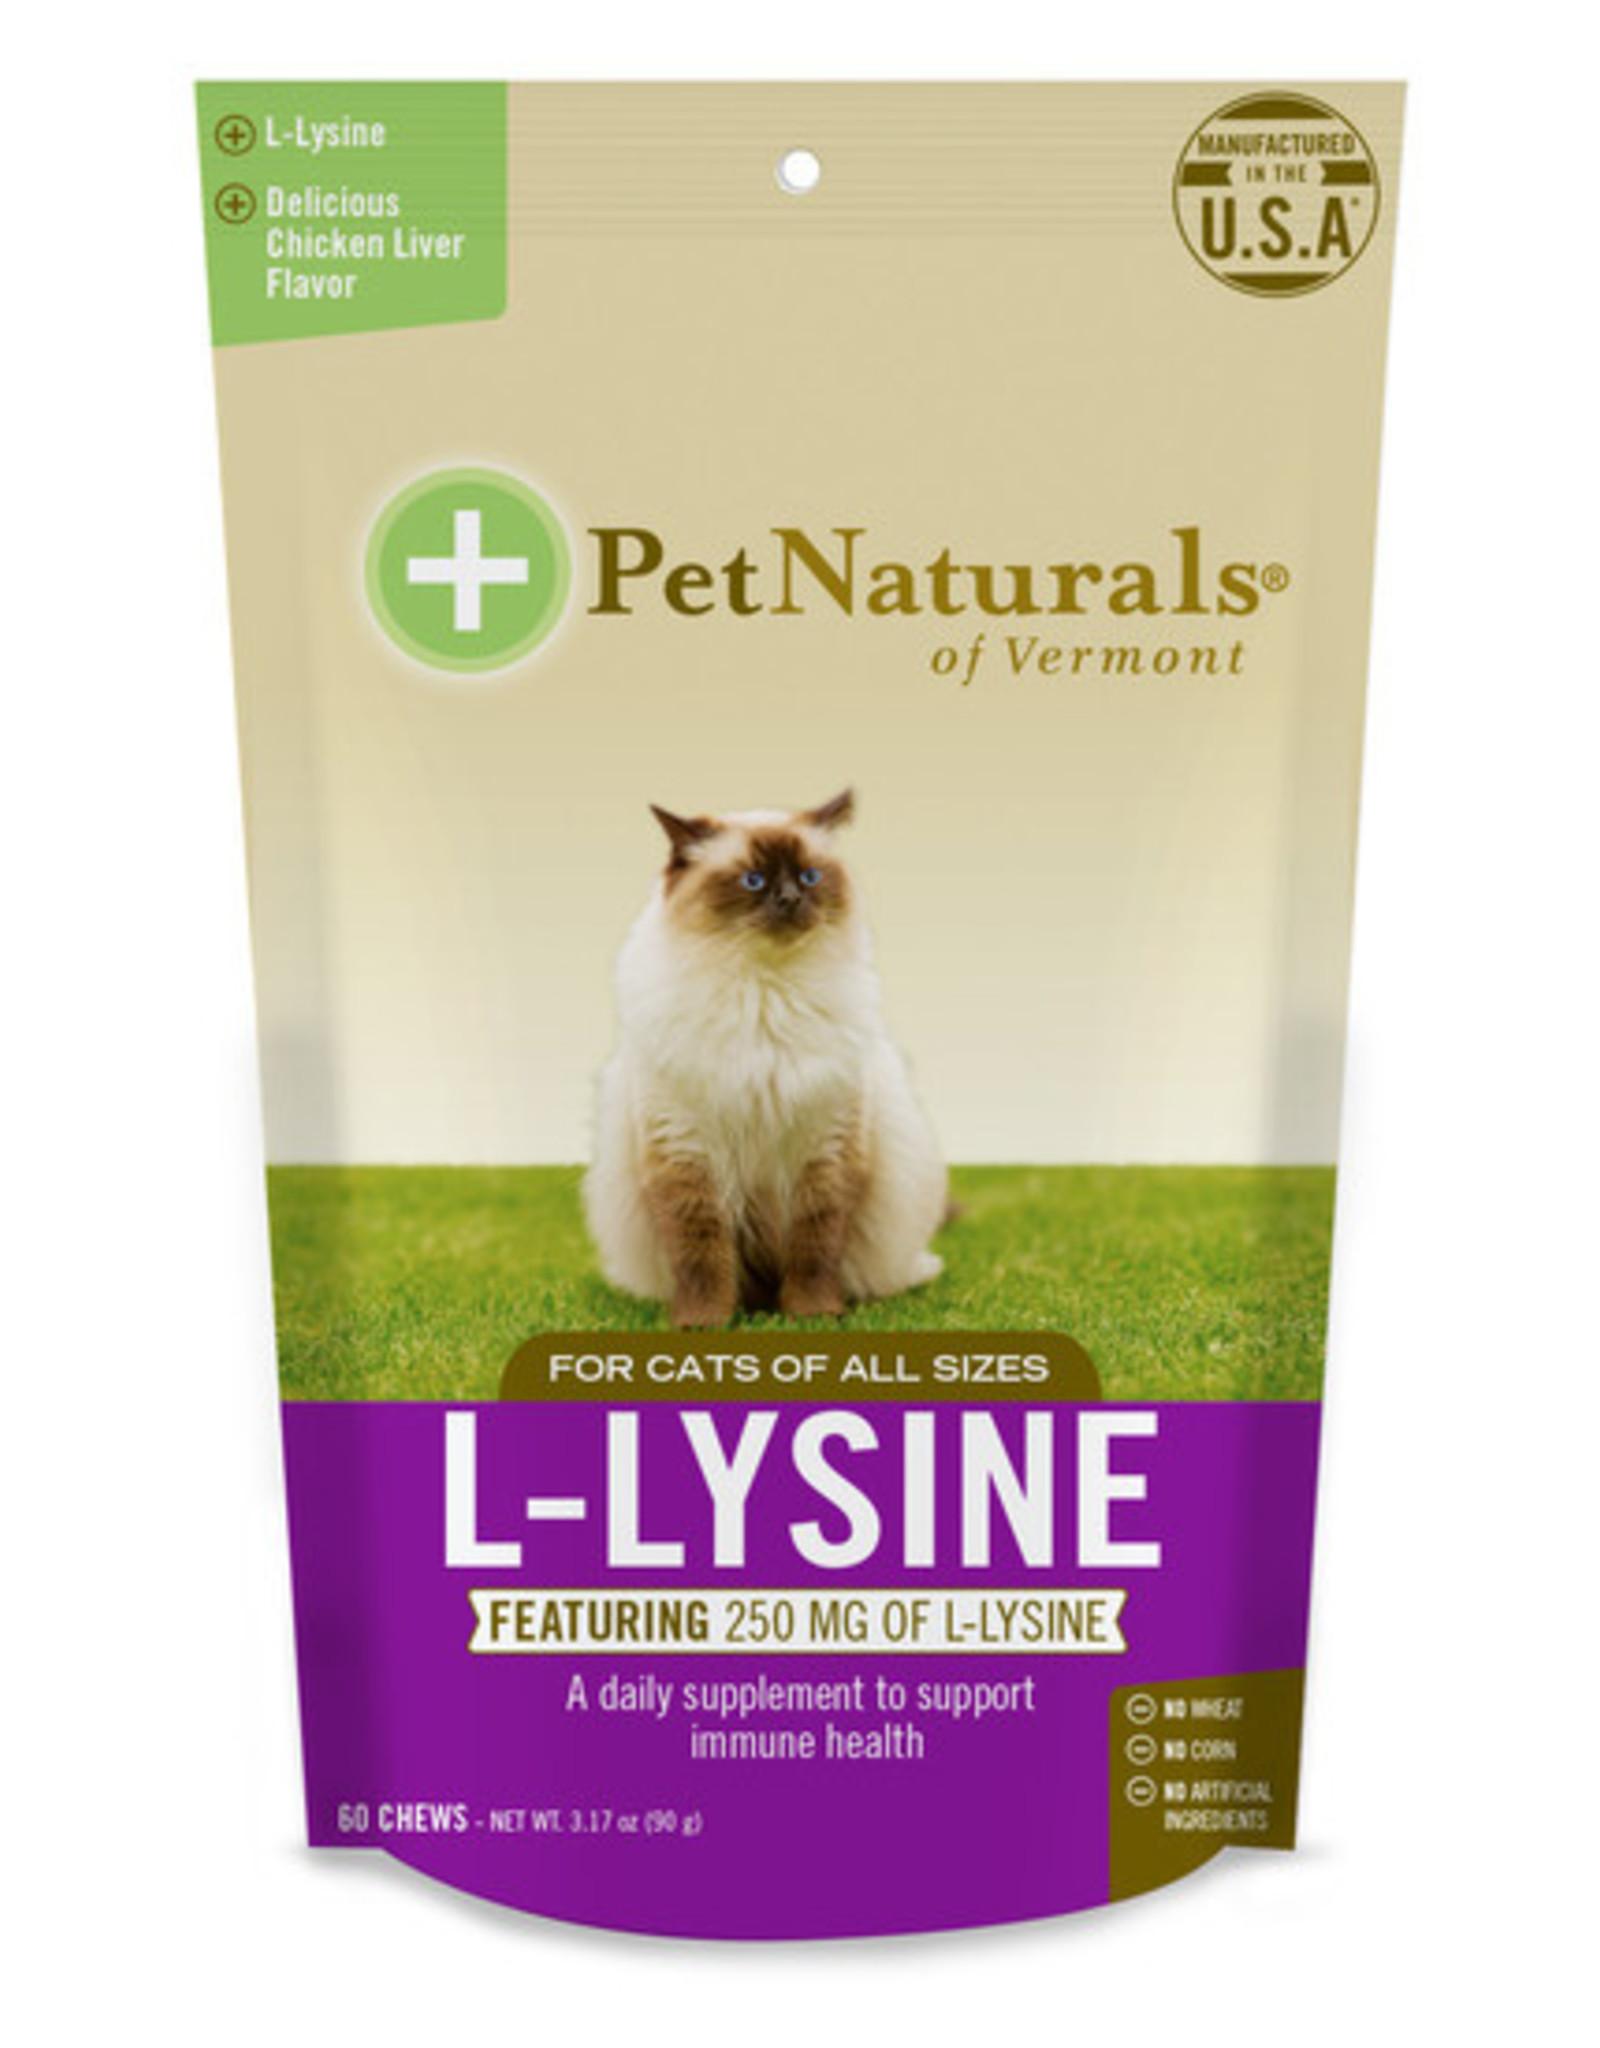 Pet Naturals Pet Naturals of Vermont Cat L-Lysine Chews 60ct